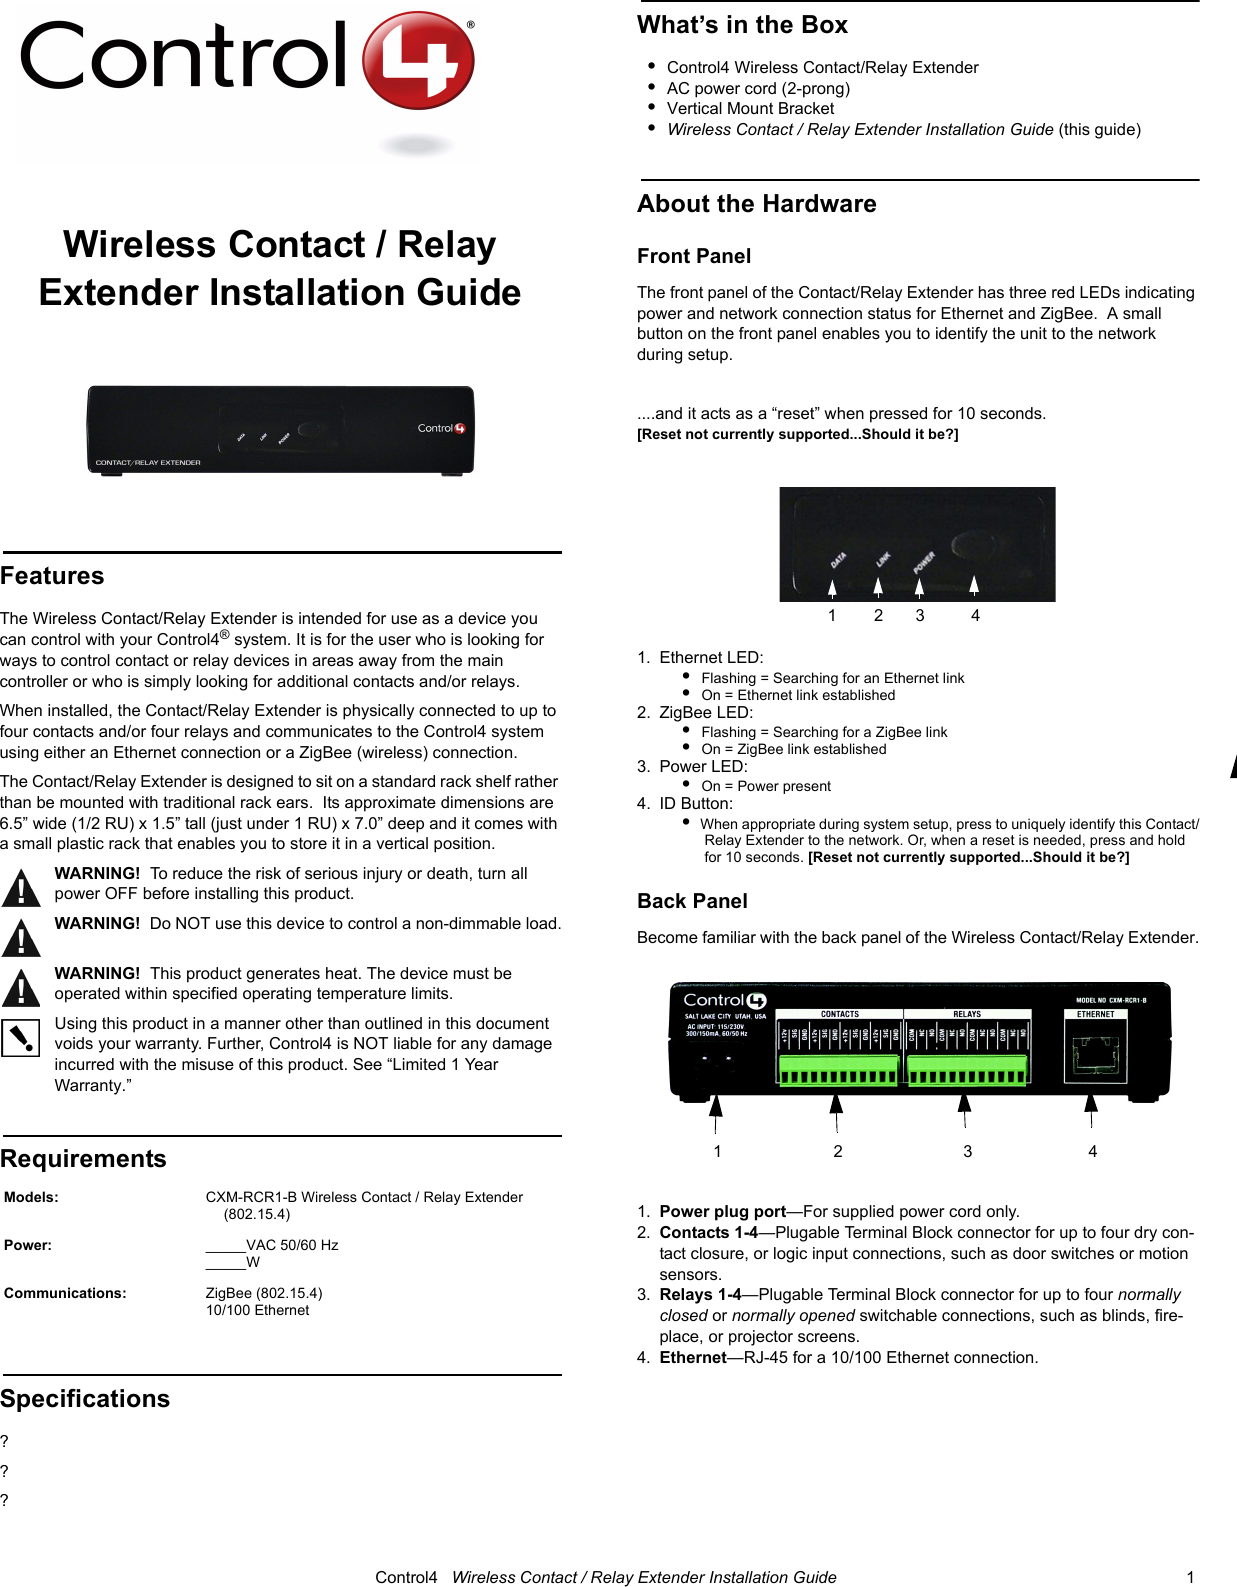 Control4 Cxmrcr11 Wireless Contact Relay Extender Model Cxm Rcr1 B Four Terminal User Manual Wirelesscontact Relayextender